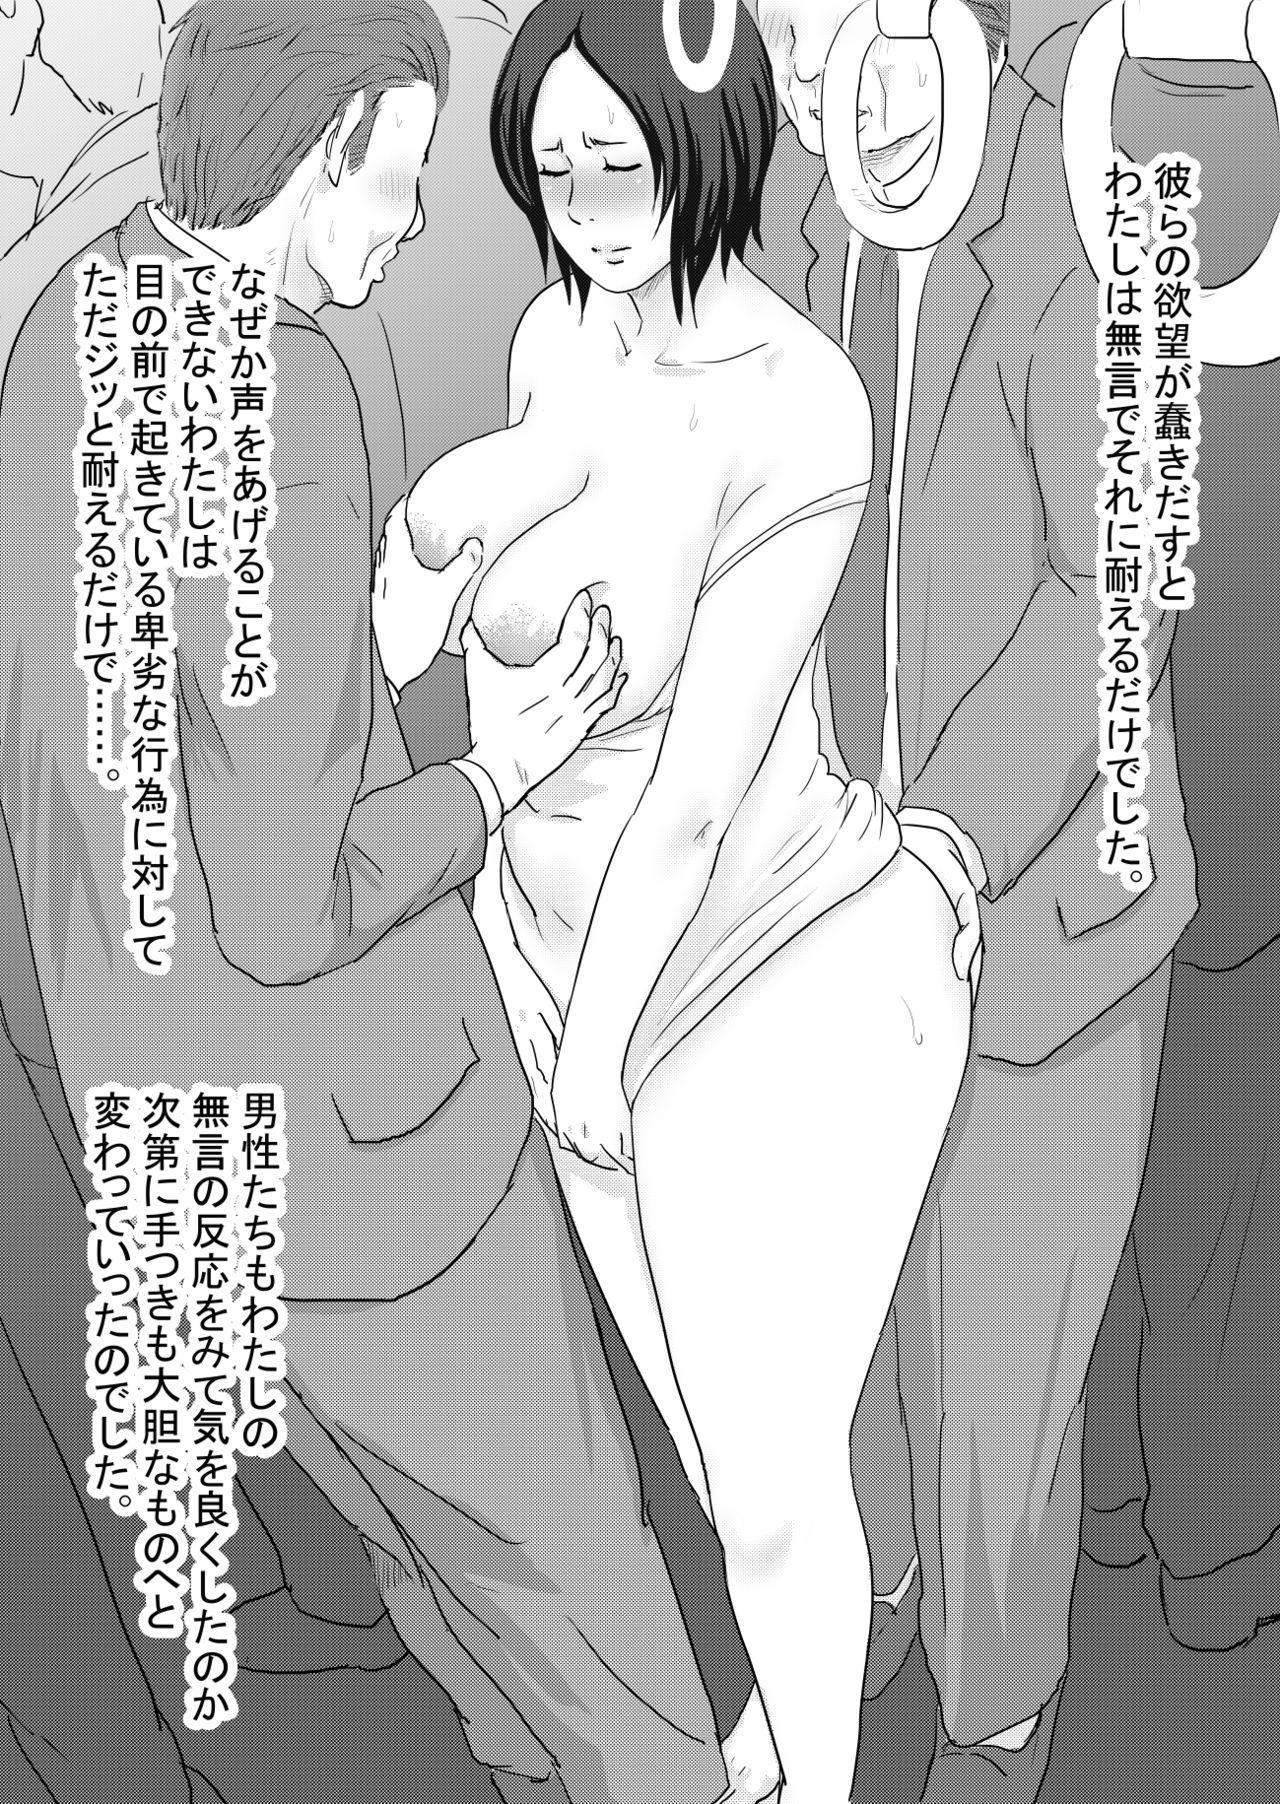 [Vulcan Nure] Mii-chan to Taa-kun 36